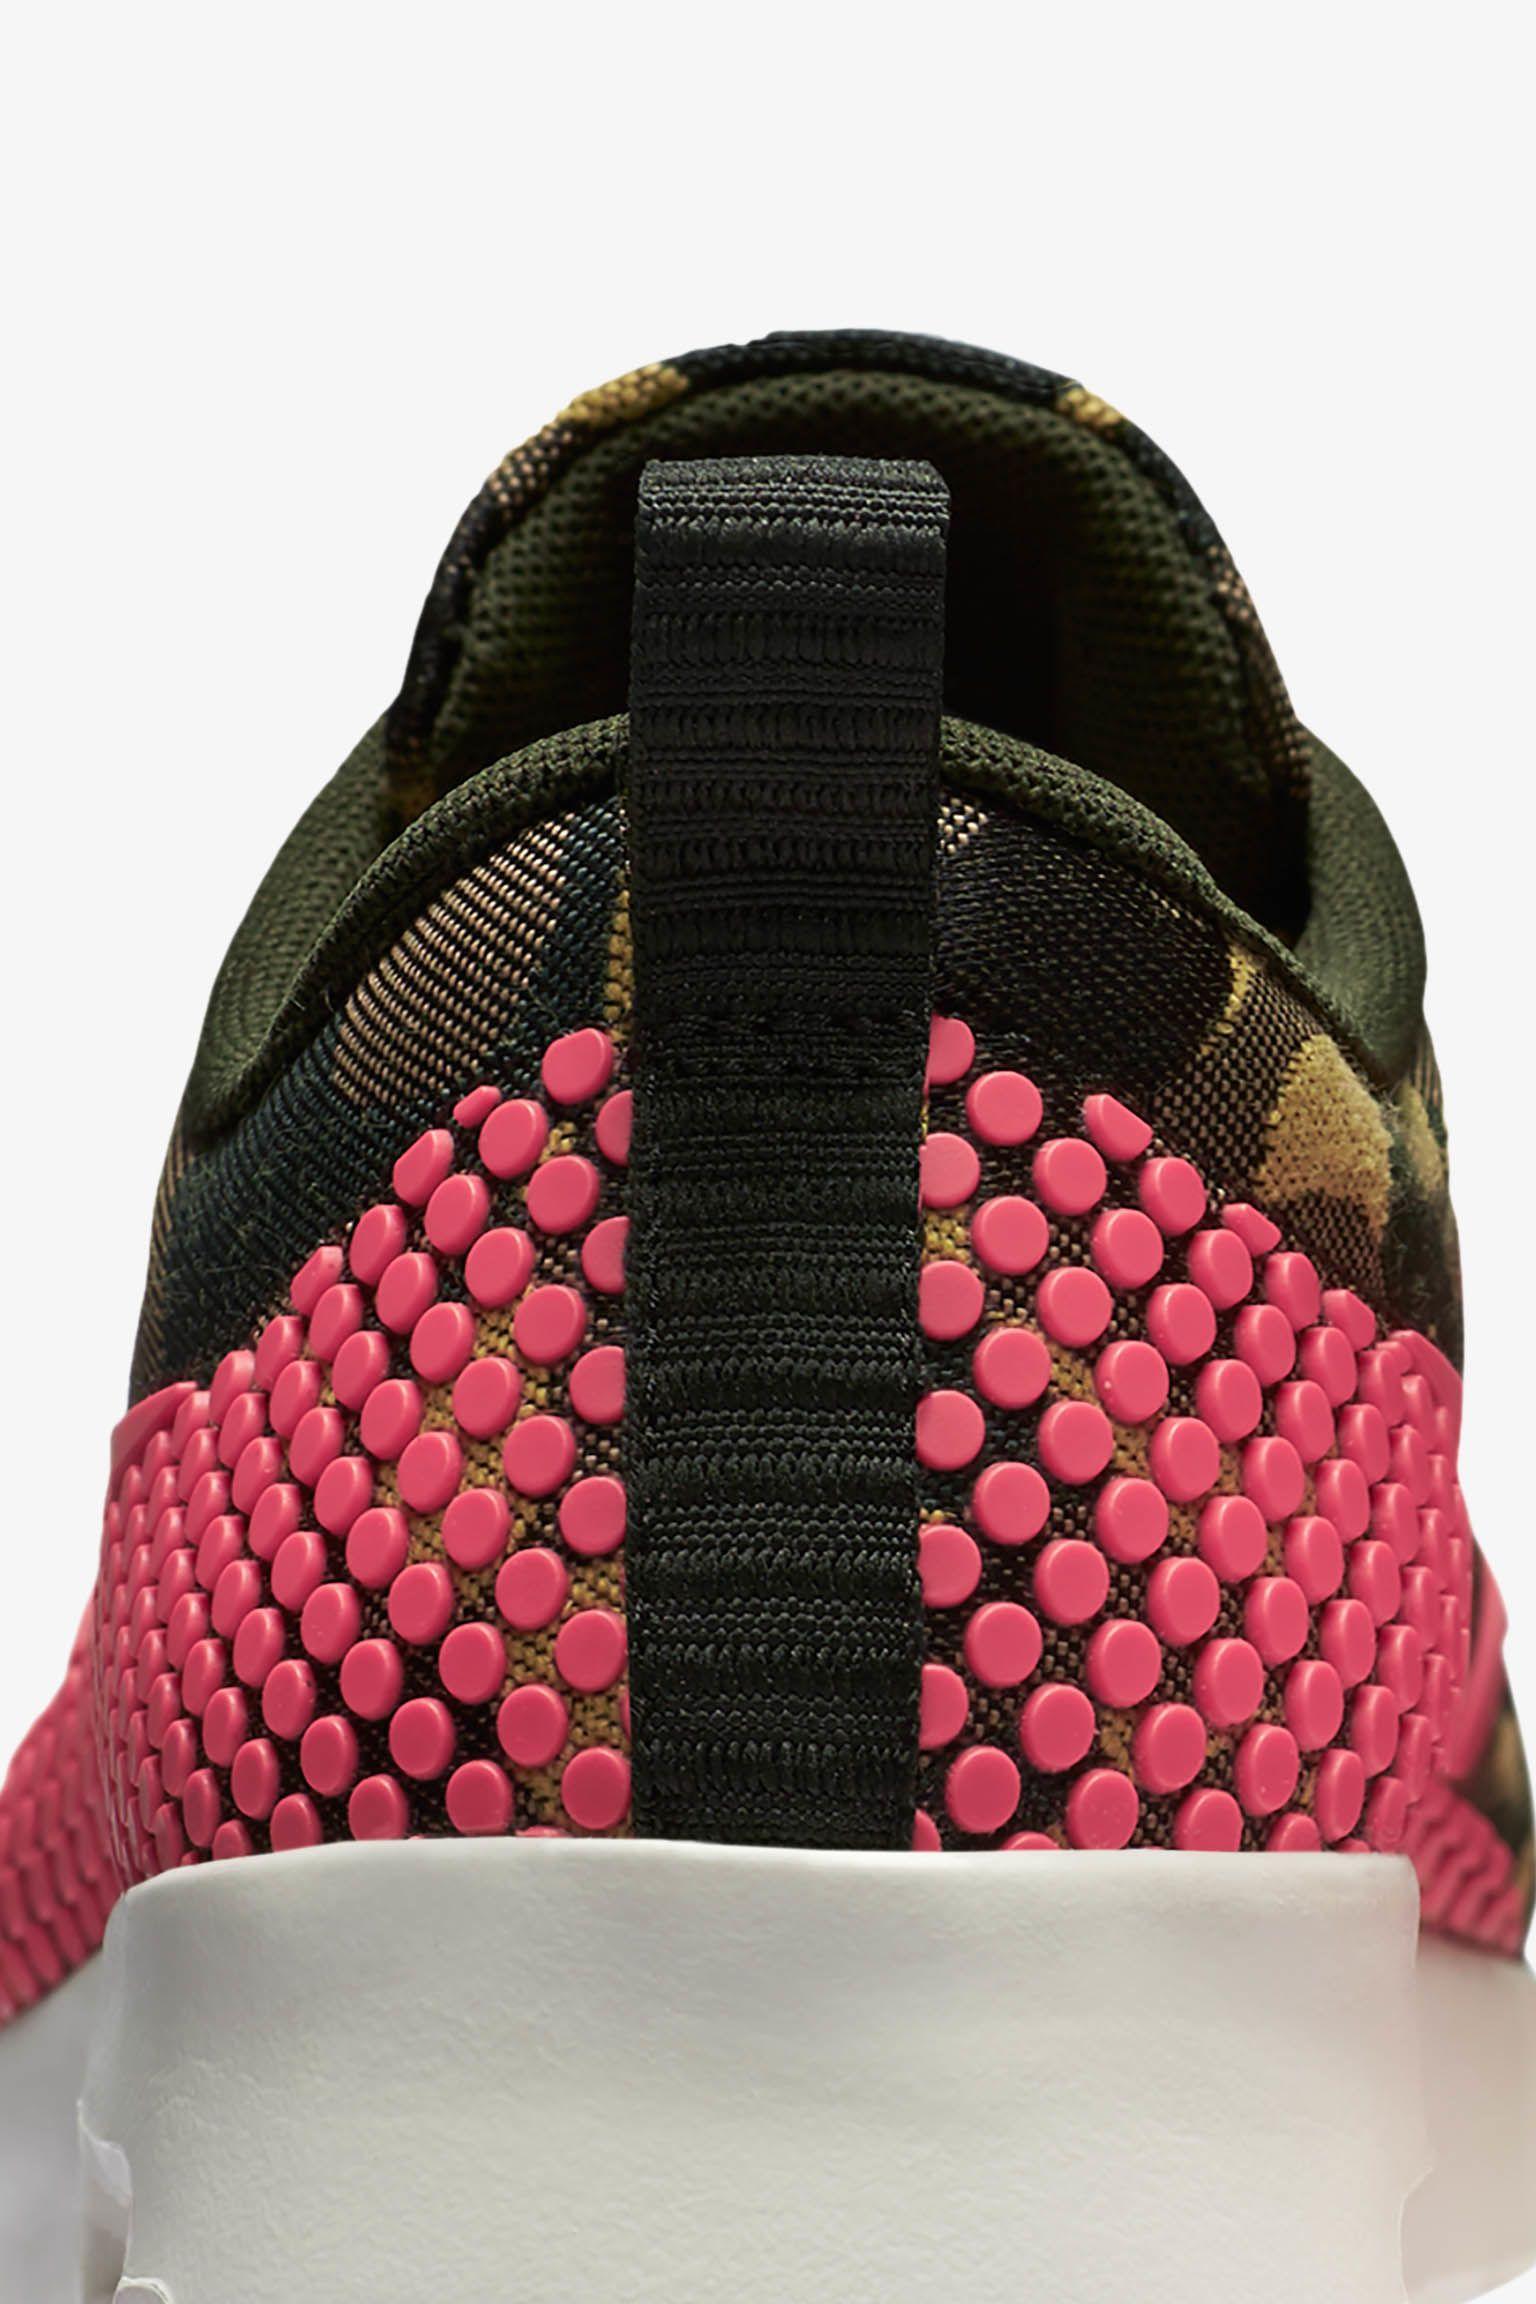 Women's Nike Air Max Thea 'Jacquard Camo'